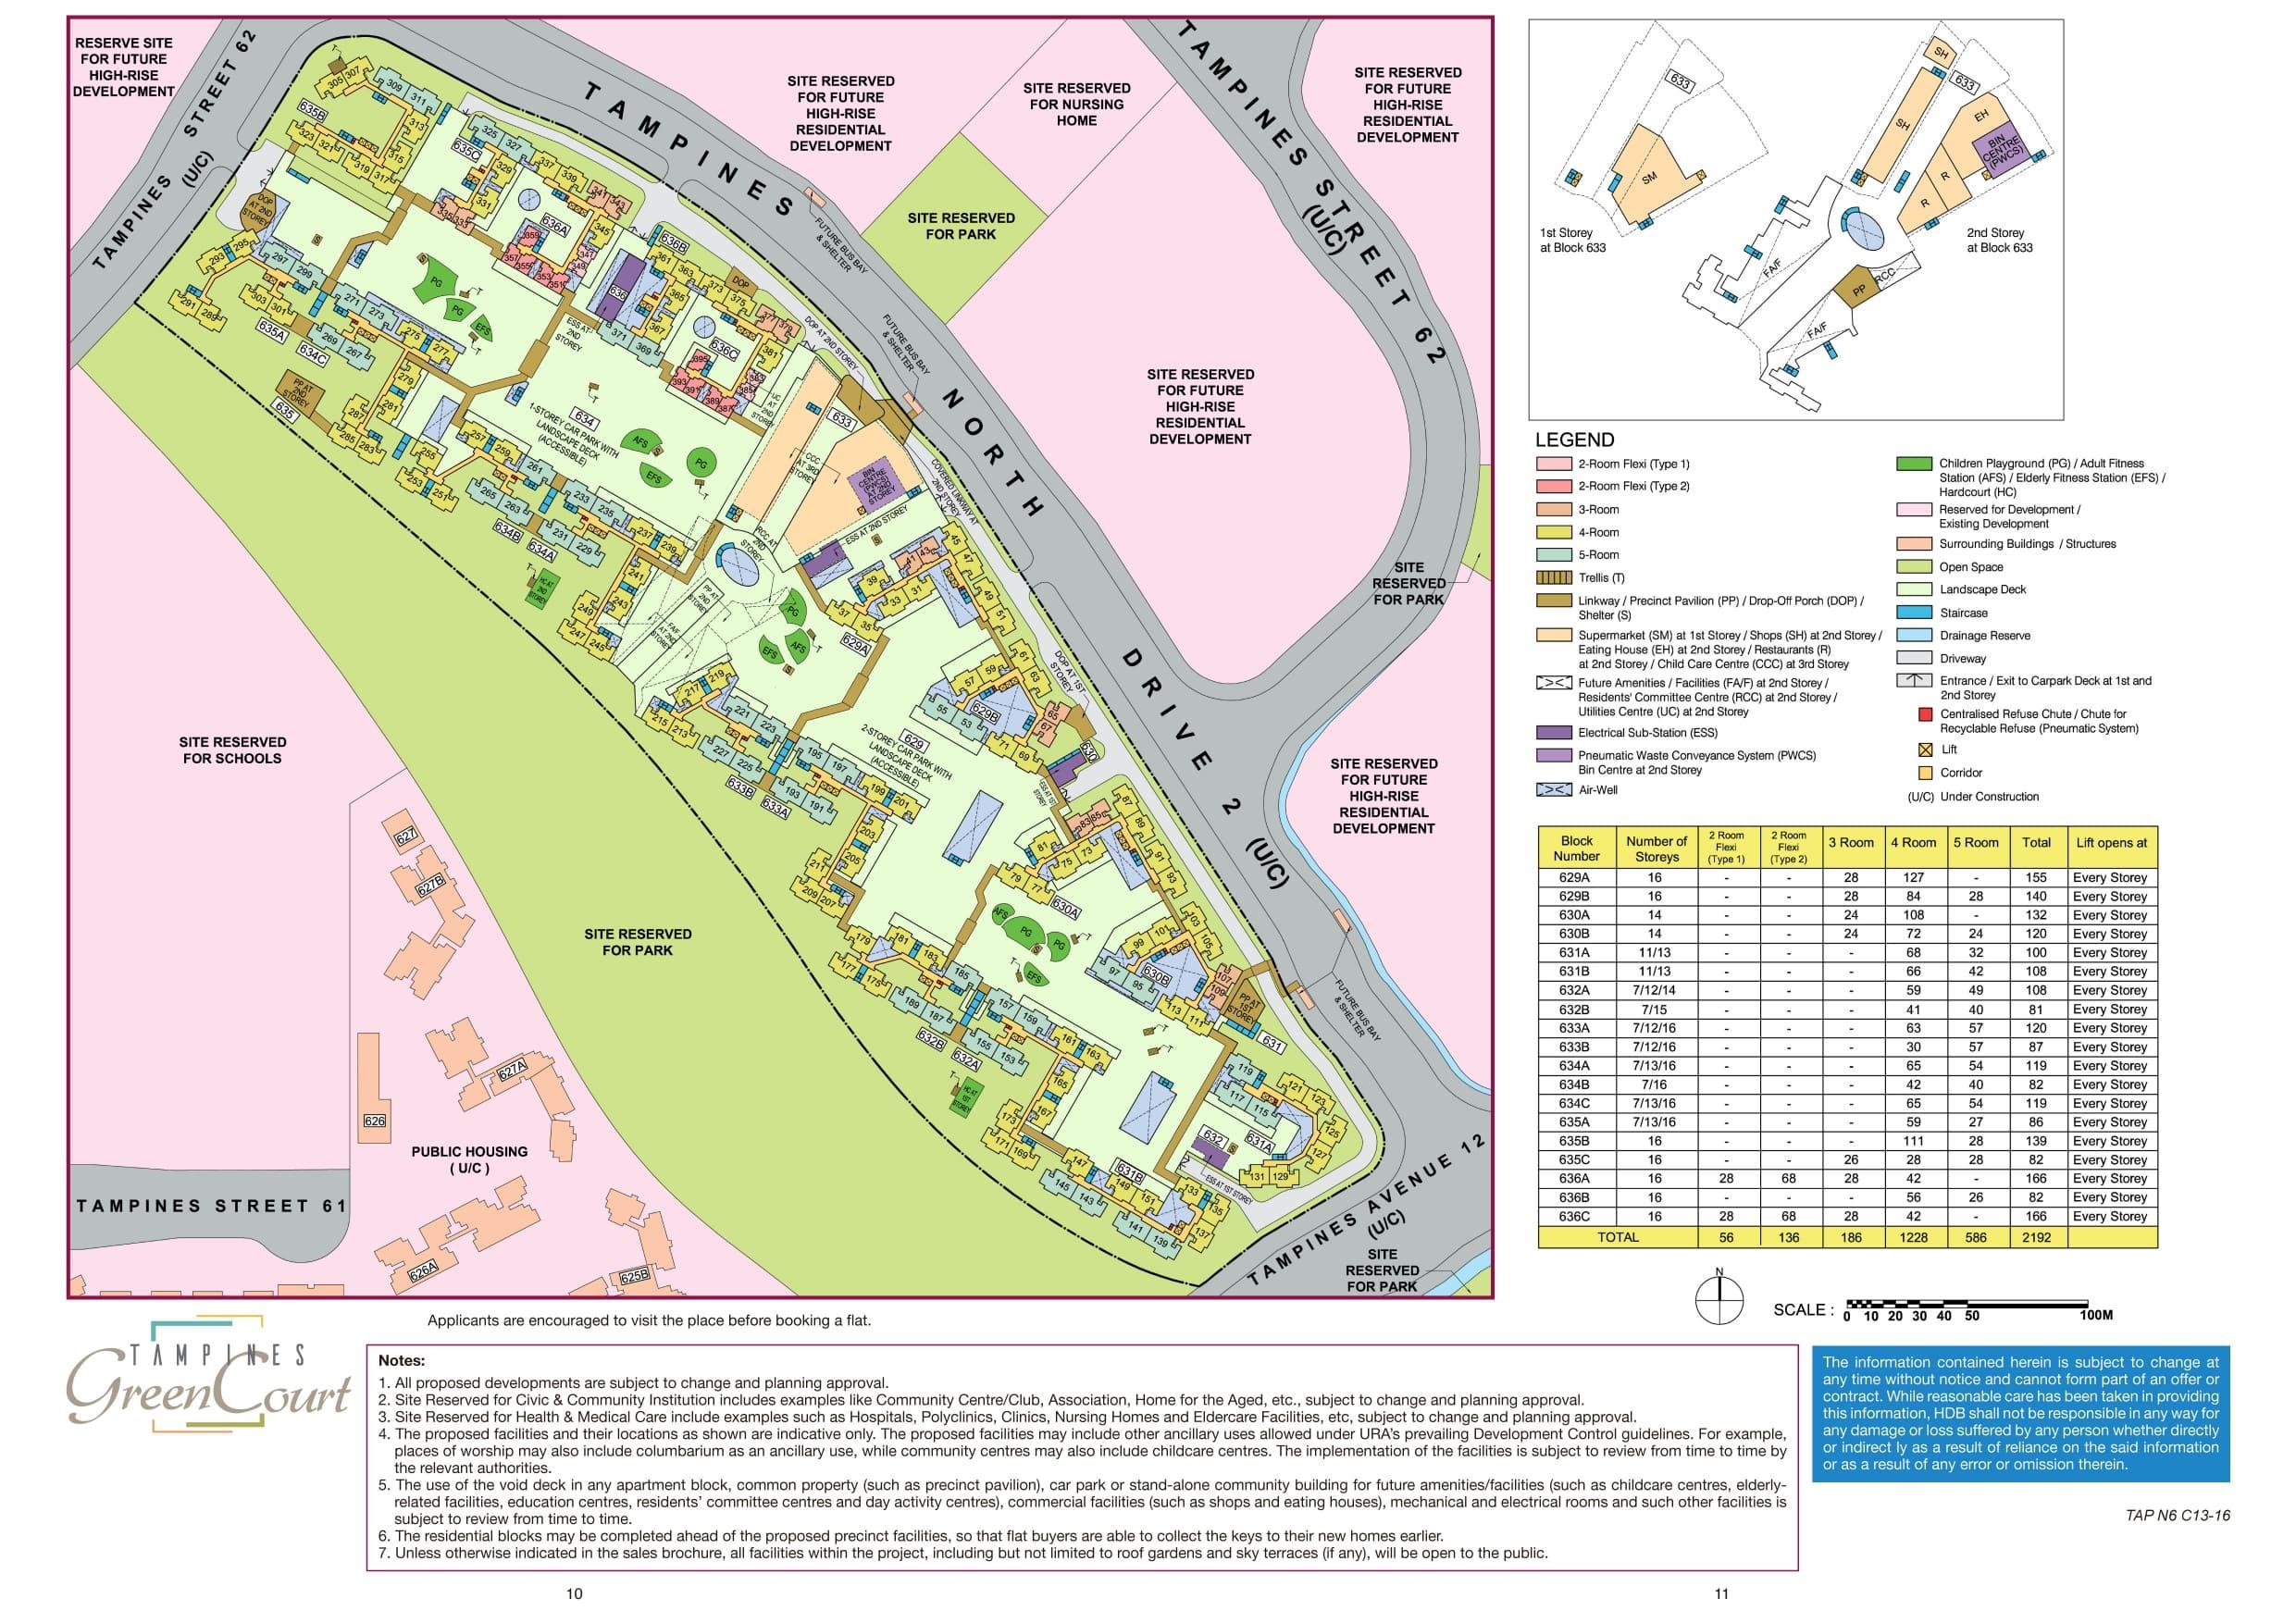 Tampines GreenCourt Site Plan